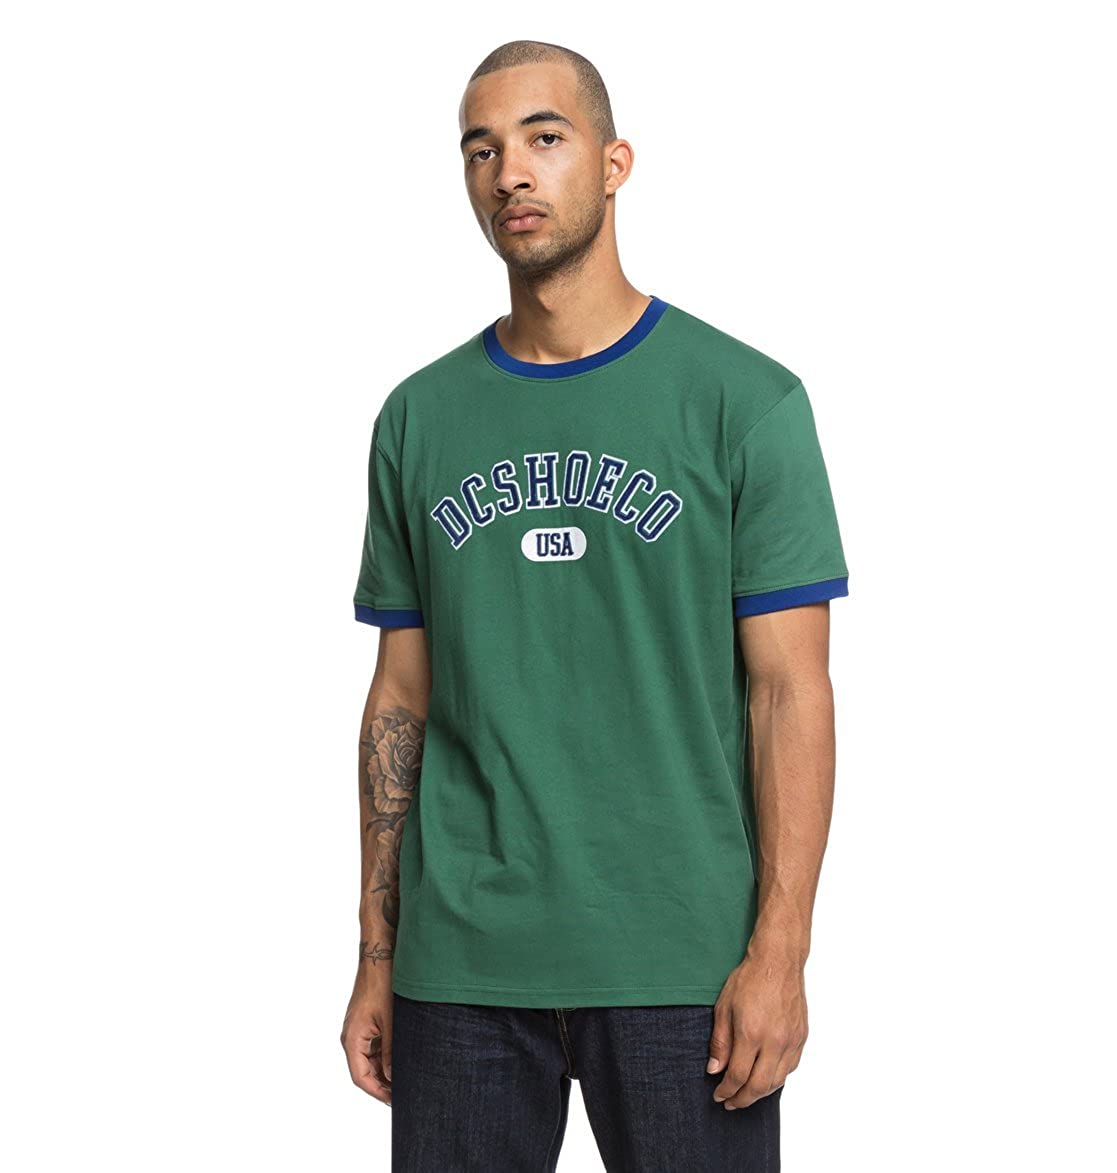 DC Shoes Glenridge - Camiseta para Hombre EDYKT03420: Amazon.es ...